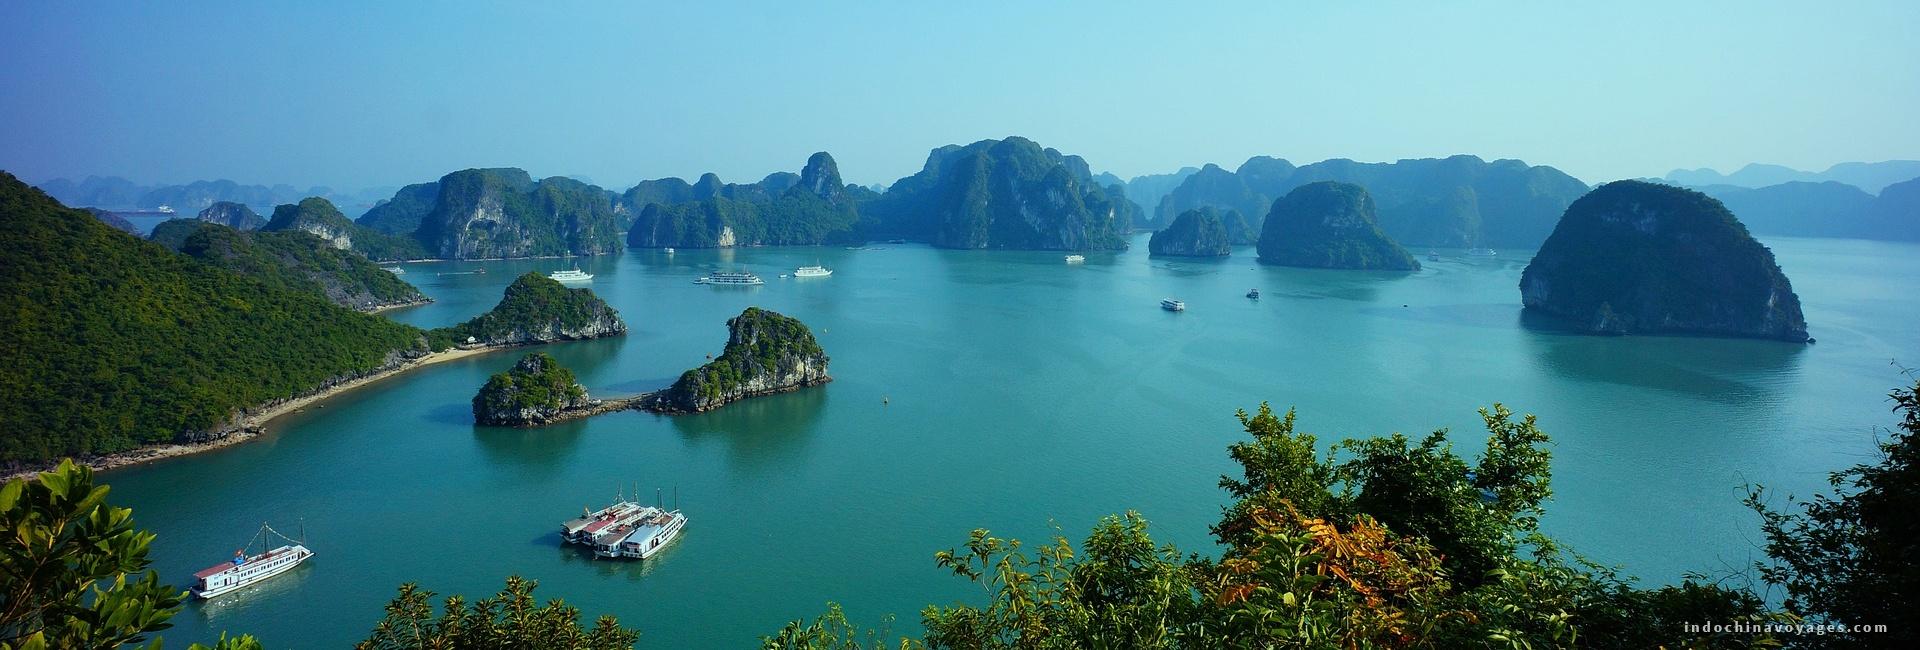 Halong Bay & Mai Chau Getaway 6 days